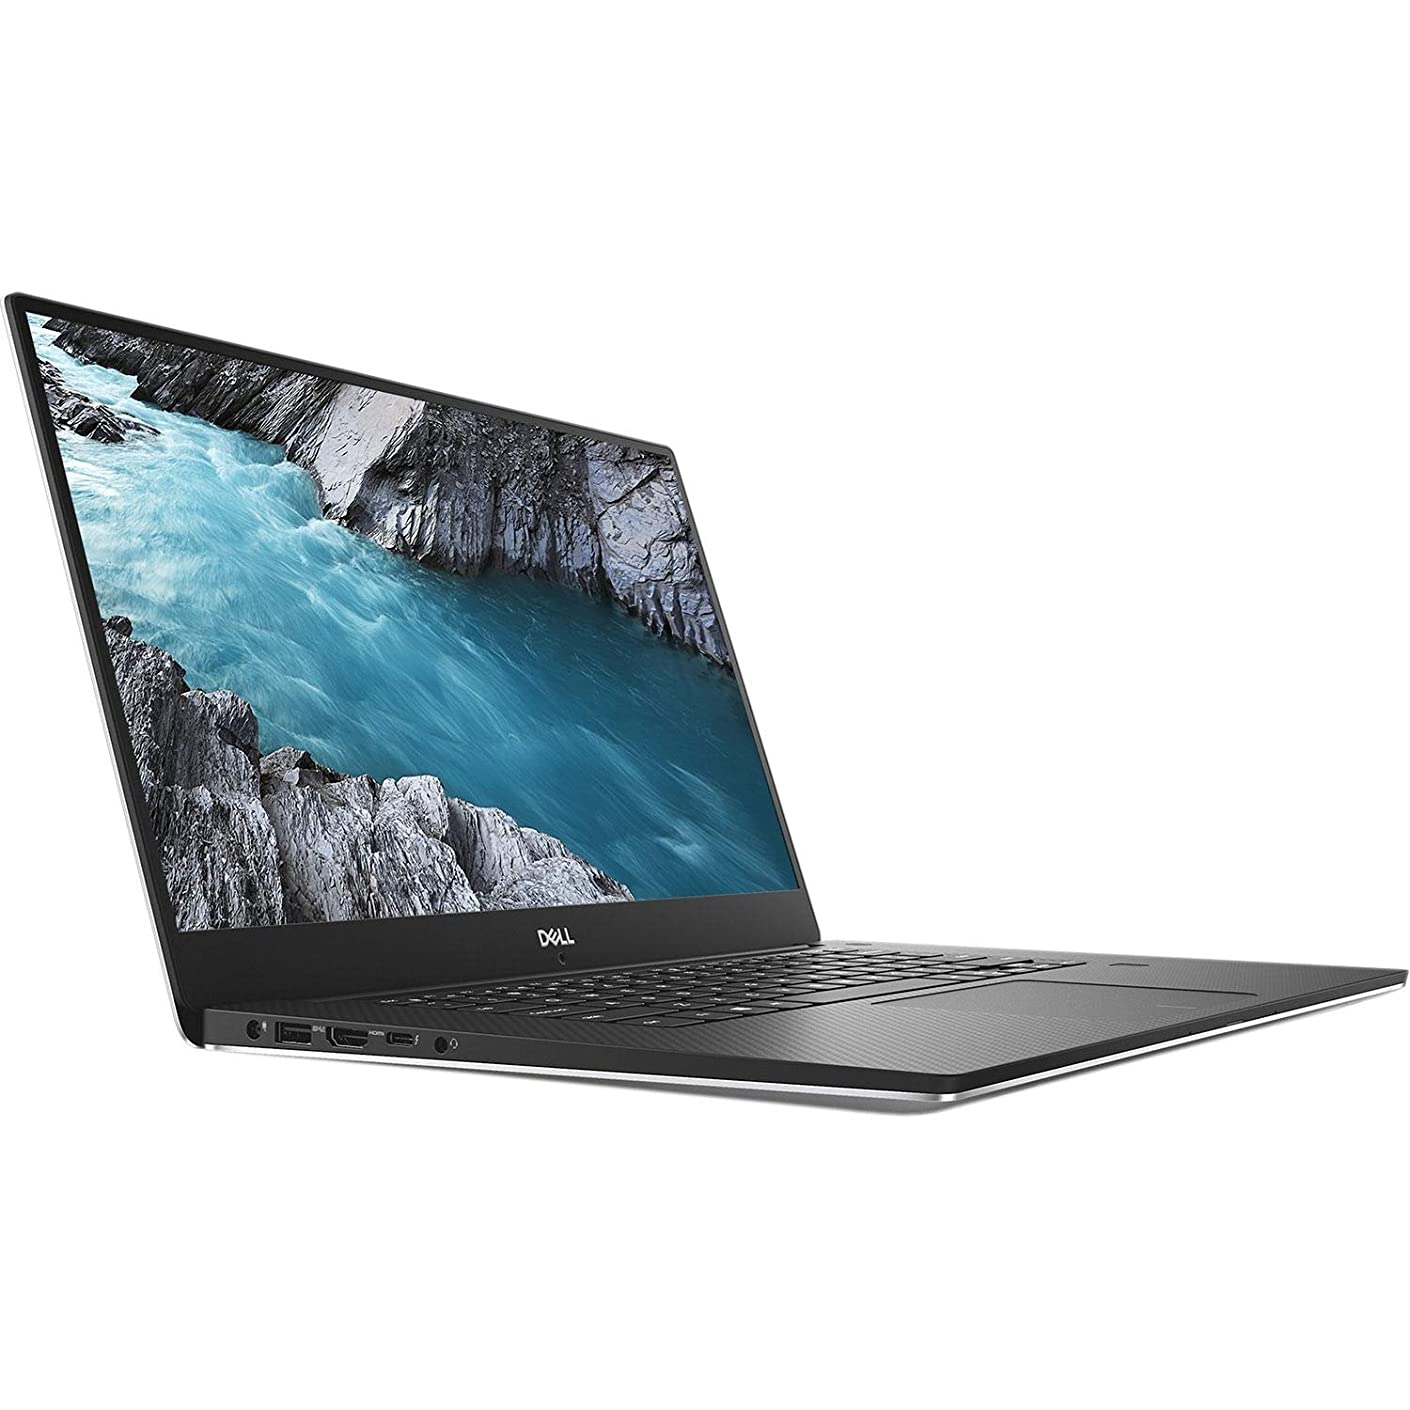 Dell XPS 15-9570 Intel Core i7-8750H X6 2.2GHz 16GB 256GB SSD 15.6in, Silver (Renewed)